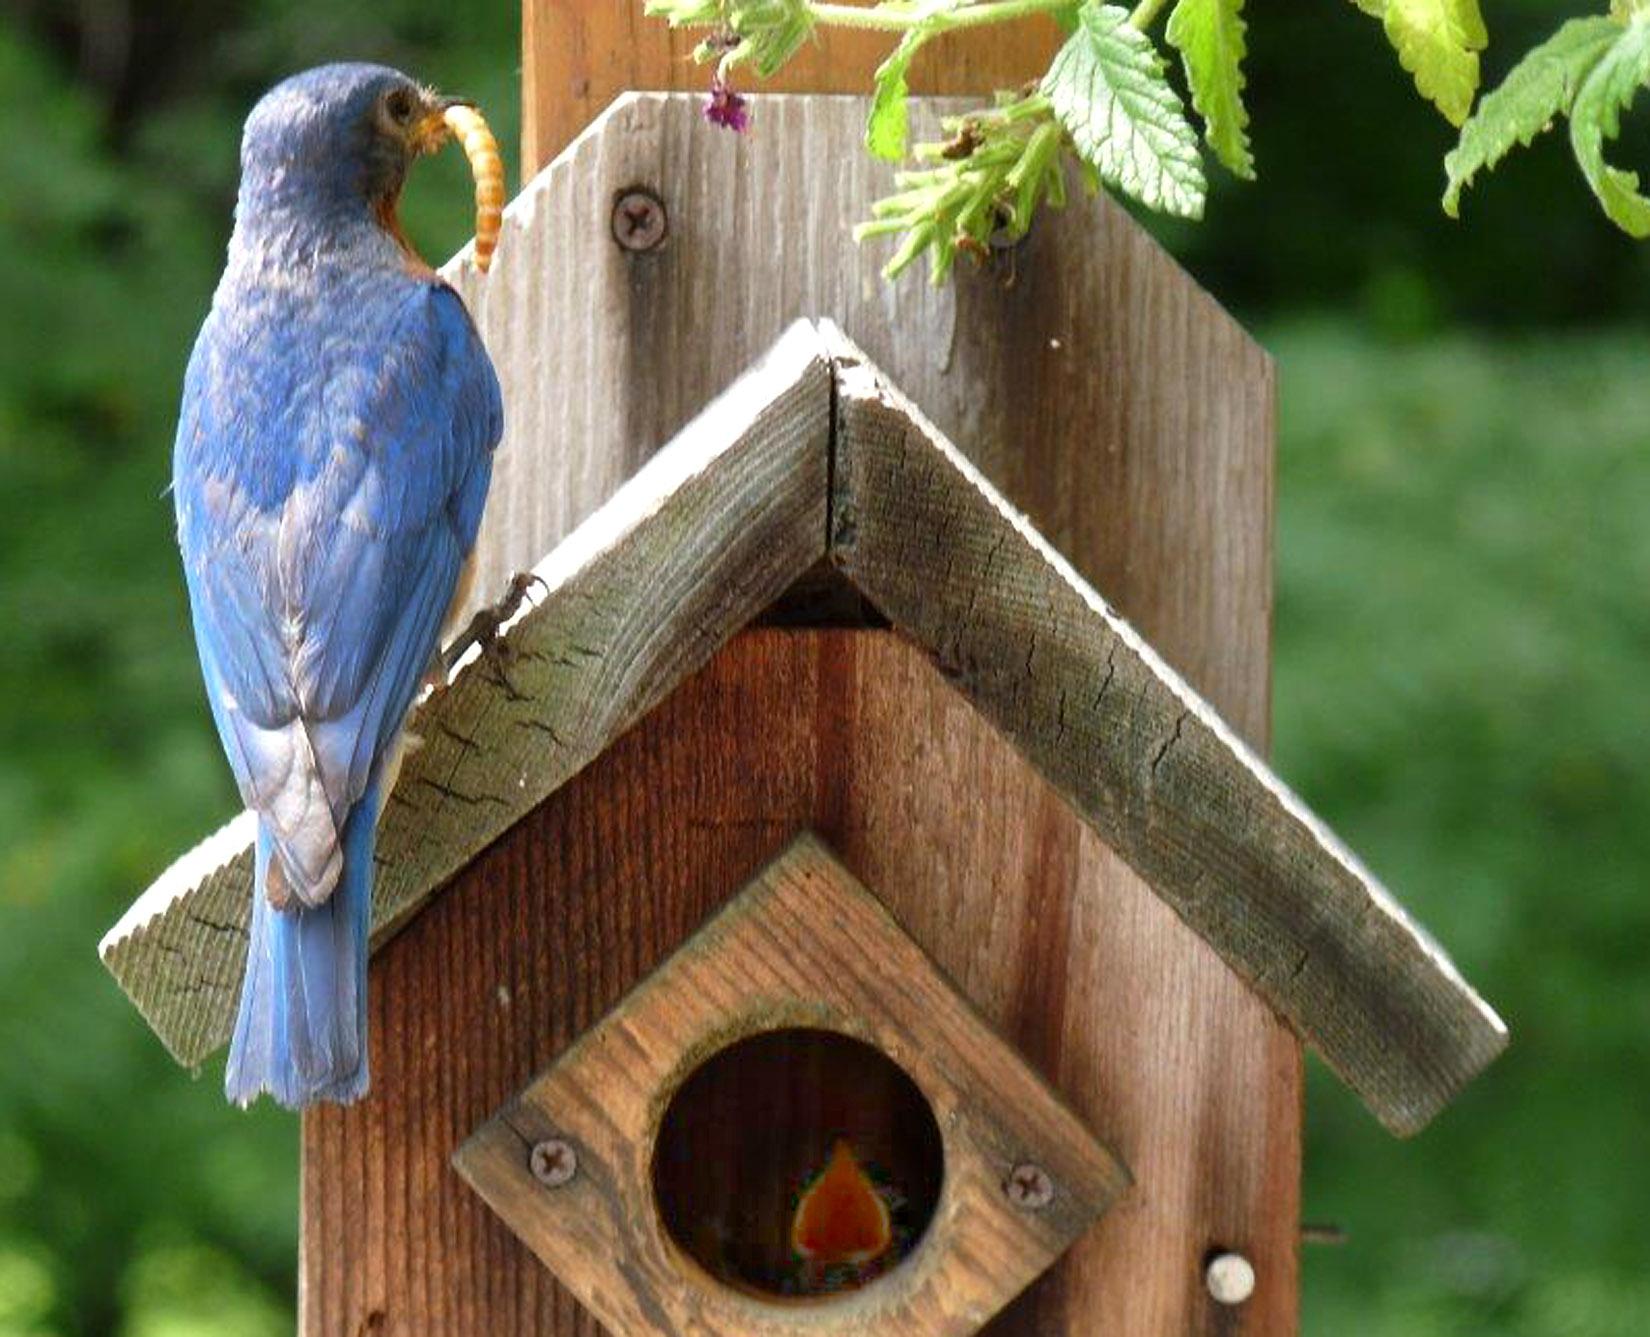 file wiki blue on jay cristata feeder cyanocitta feeders wikimedia bird